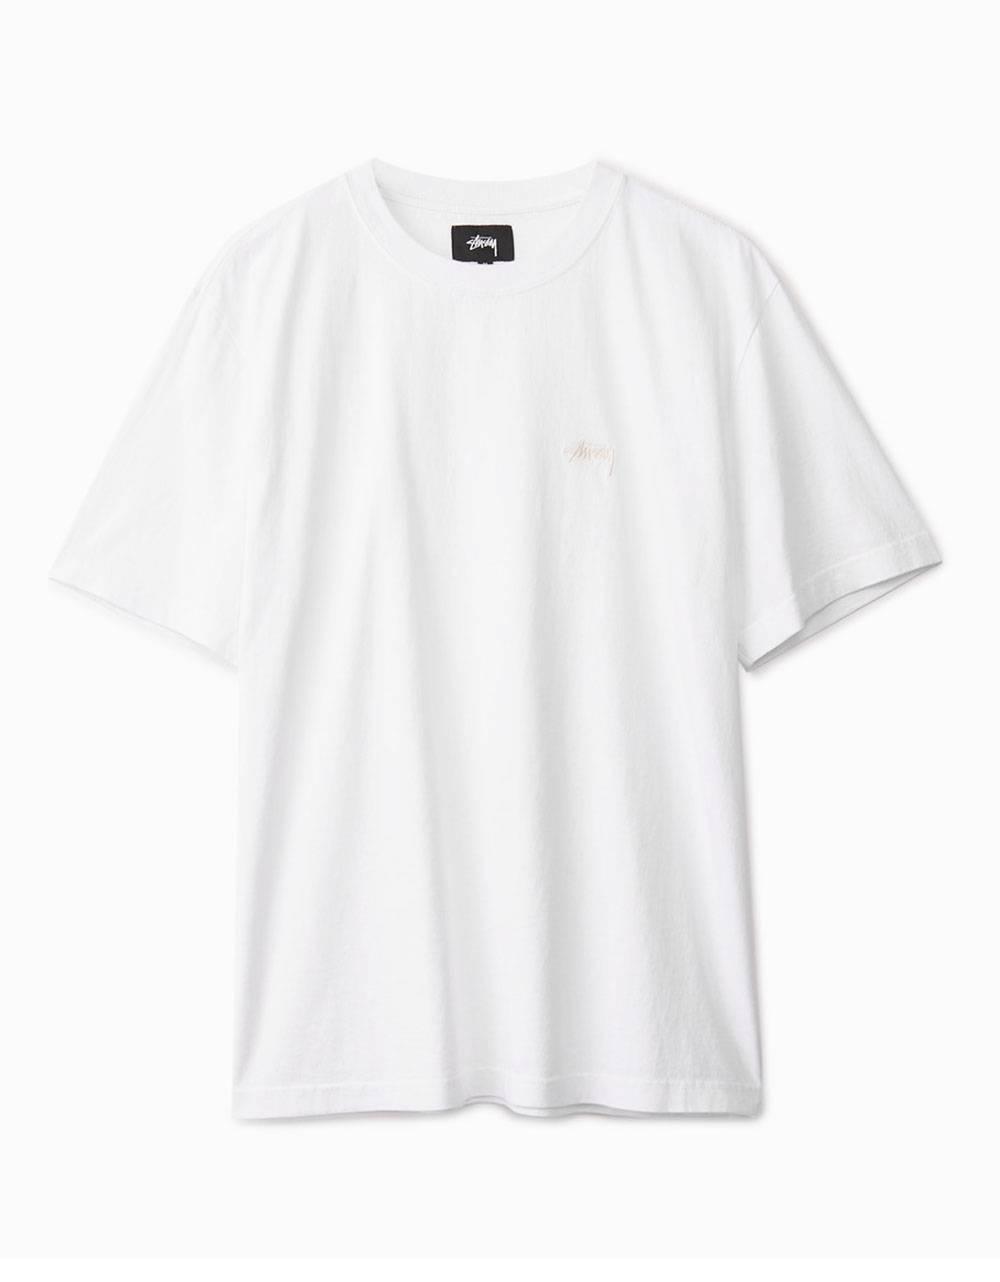 Stussy Stock logo crew tee - natural Stussy T-shirt 70,00€